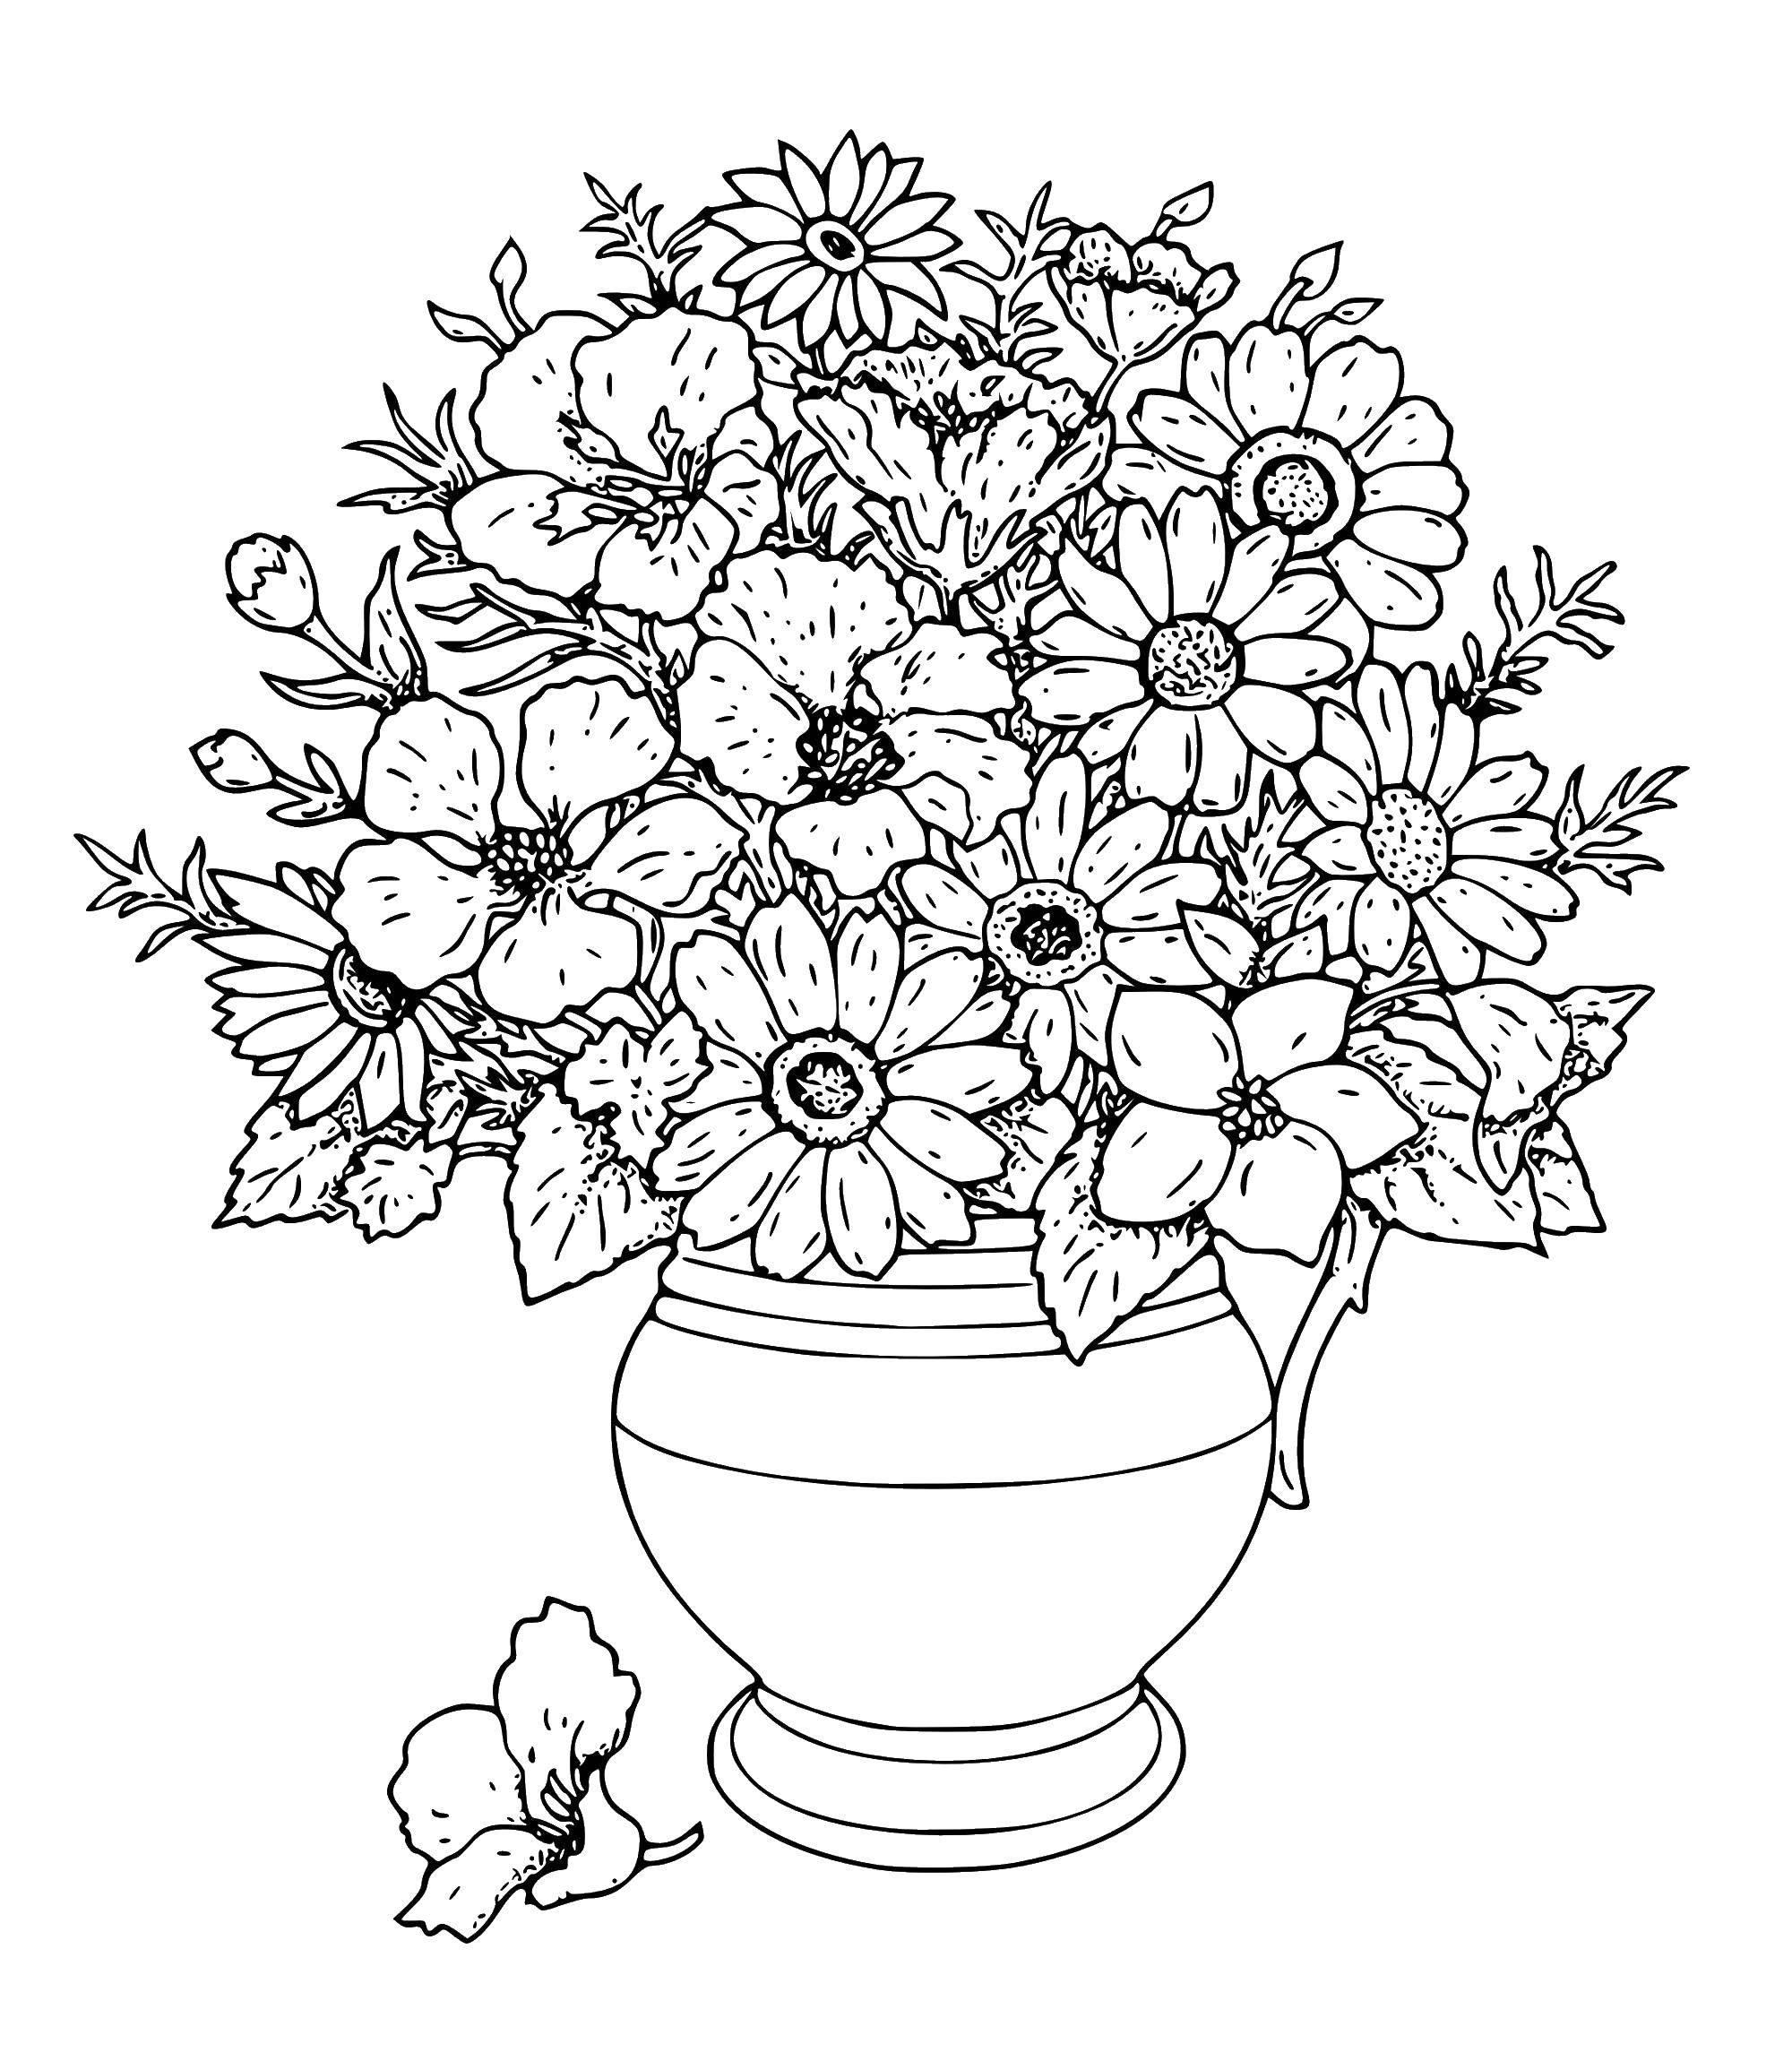 Раскраски Раскраска Букет цветов и ваза раскраски для ...